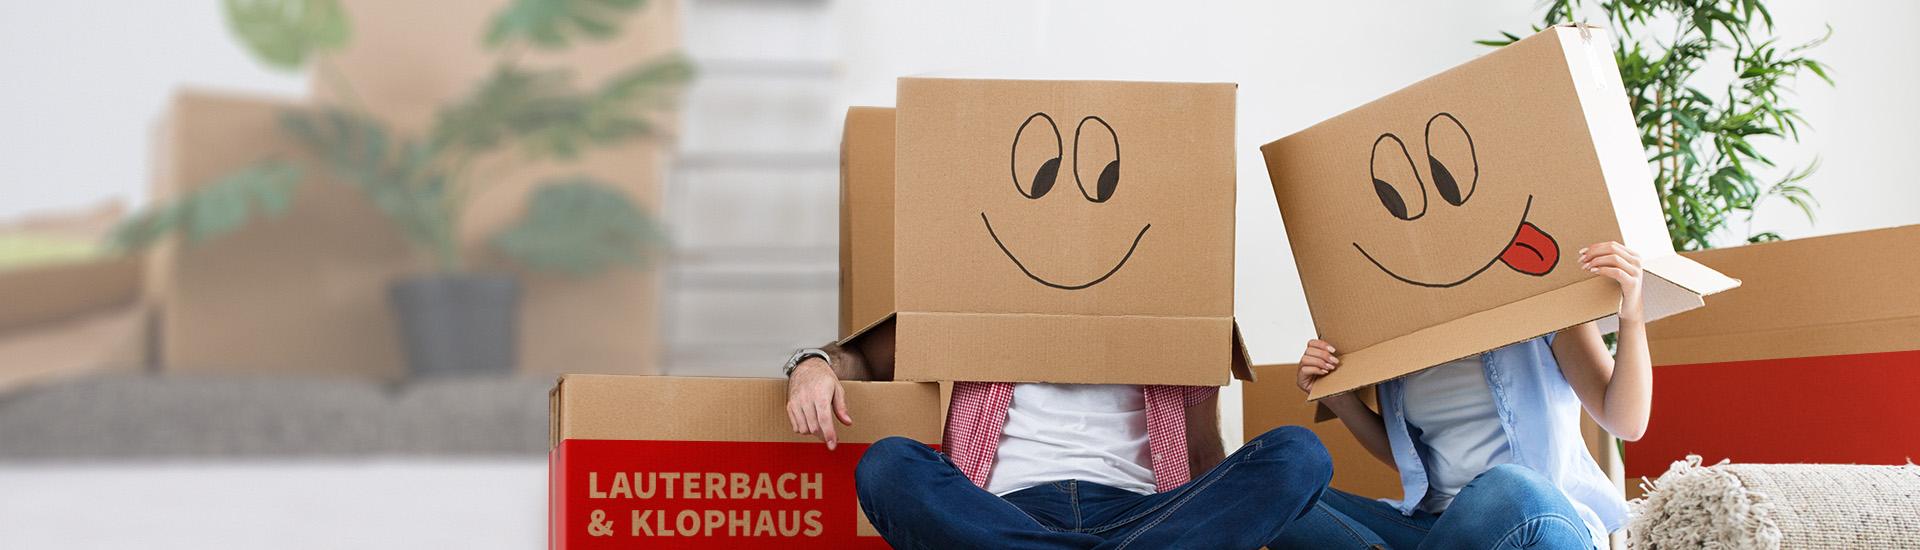 Umzugskarton mit Smileys